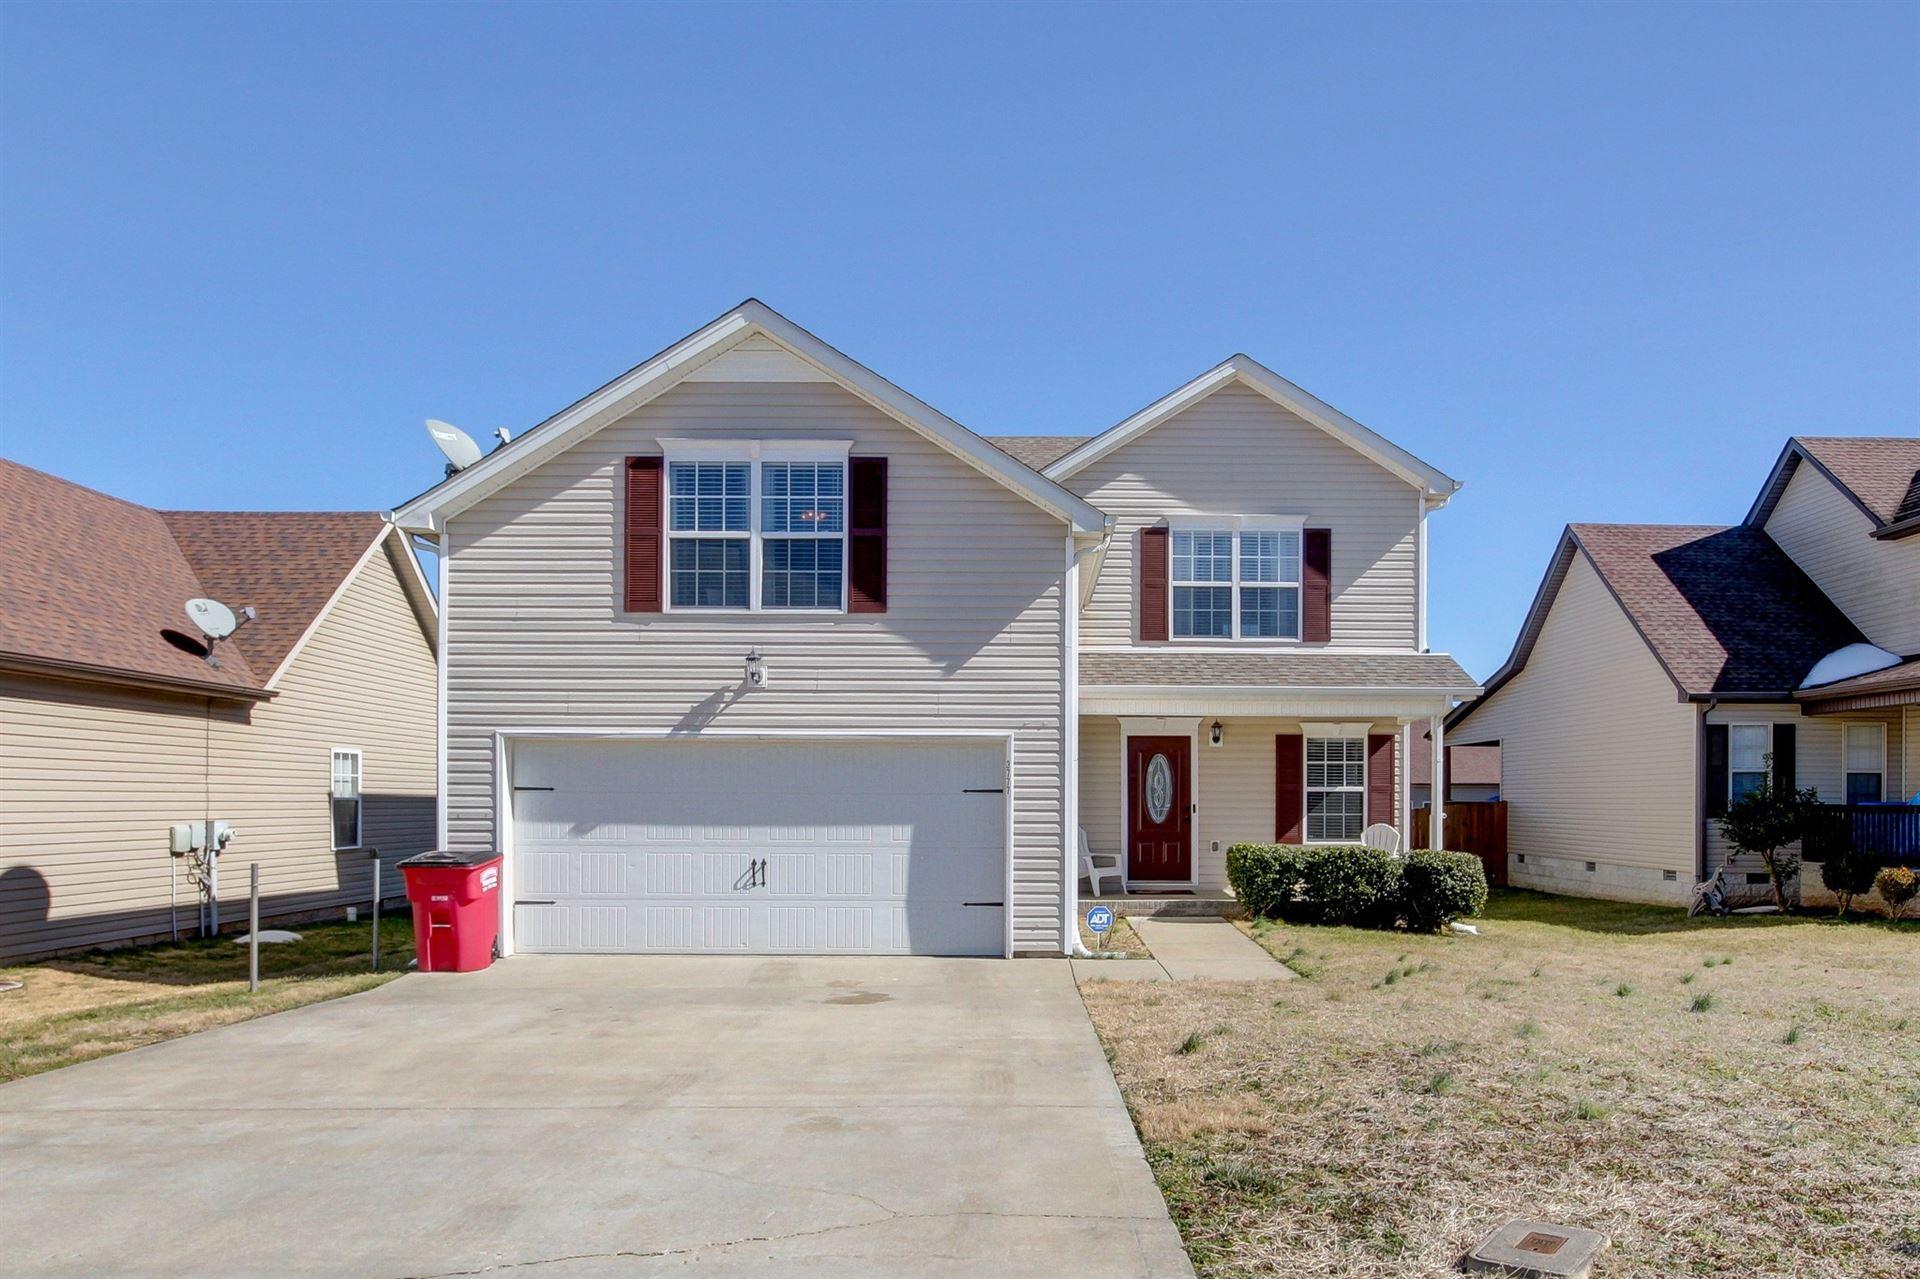 3777 Suiter Rd, Clarksville, TN 37040 - MLS#: 2233127